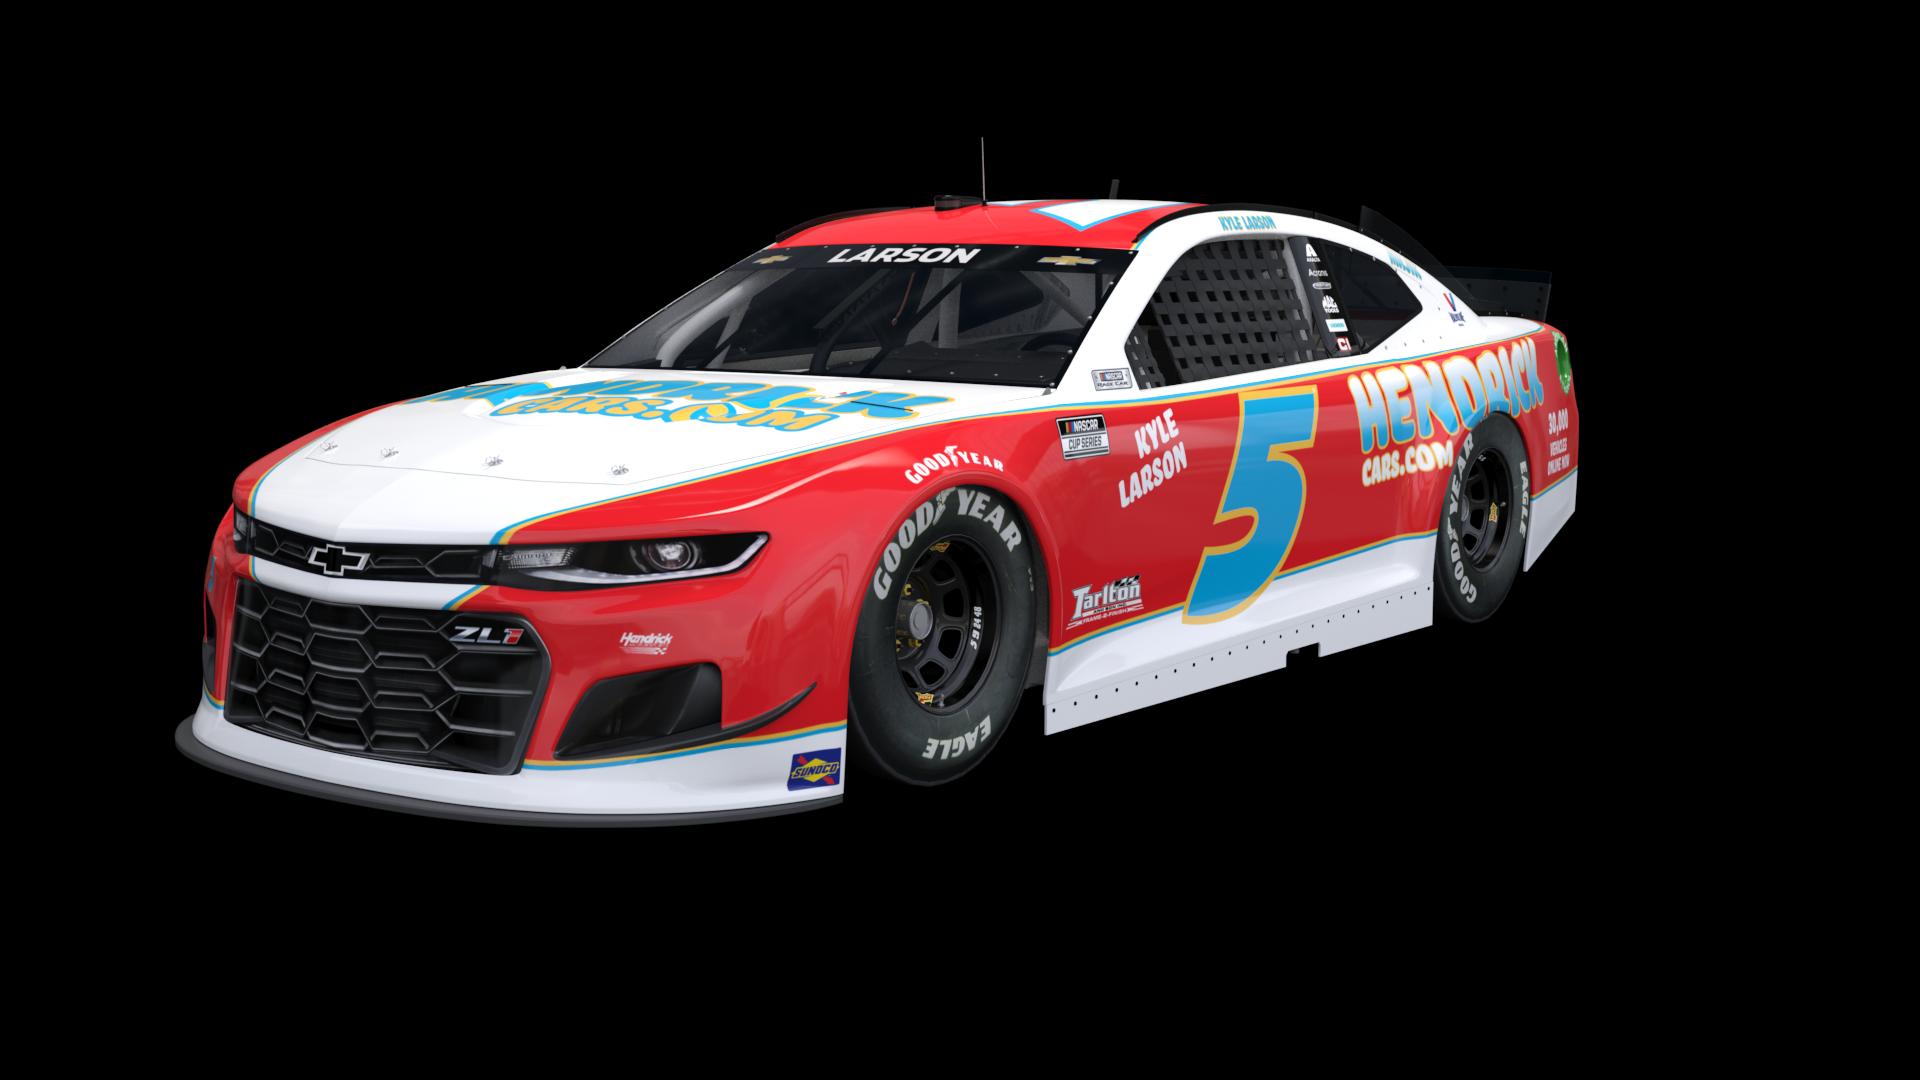 NASCAR Throwback - Kyle Larson - 2021 Darlington Raceway throwback